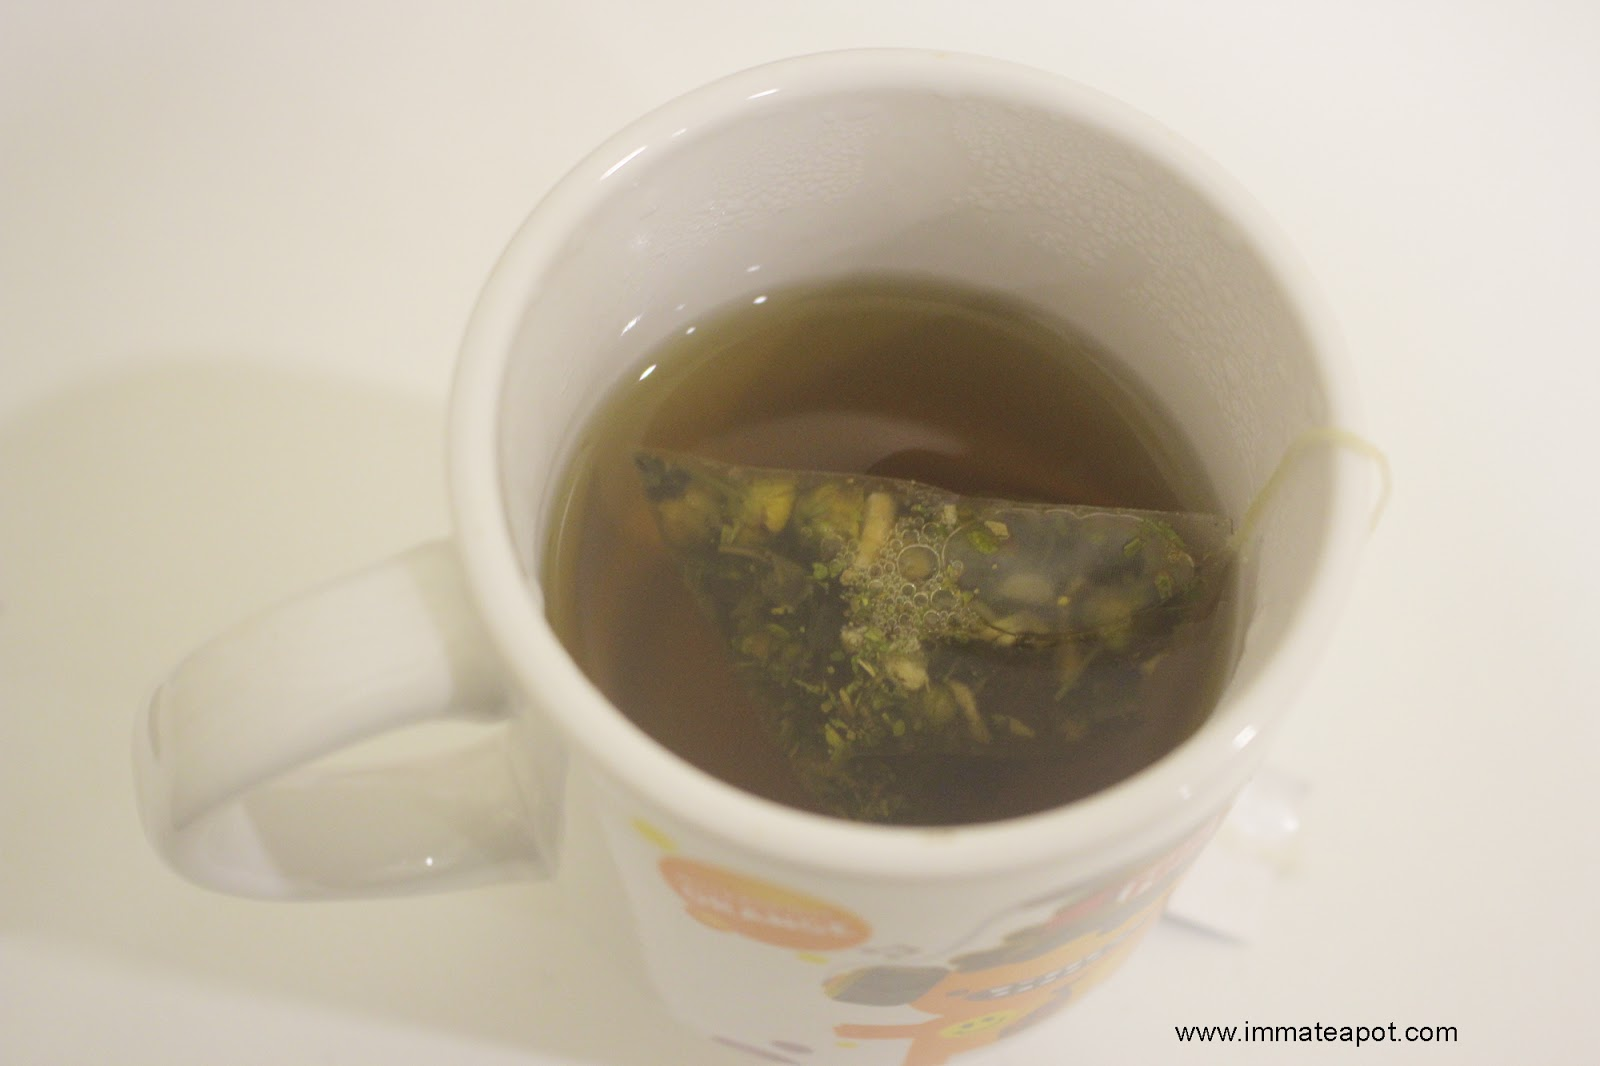 tasteless tea company